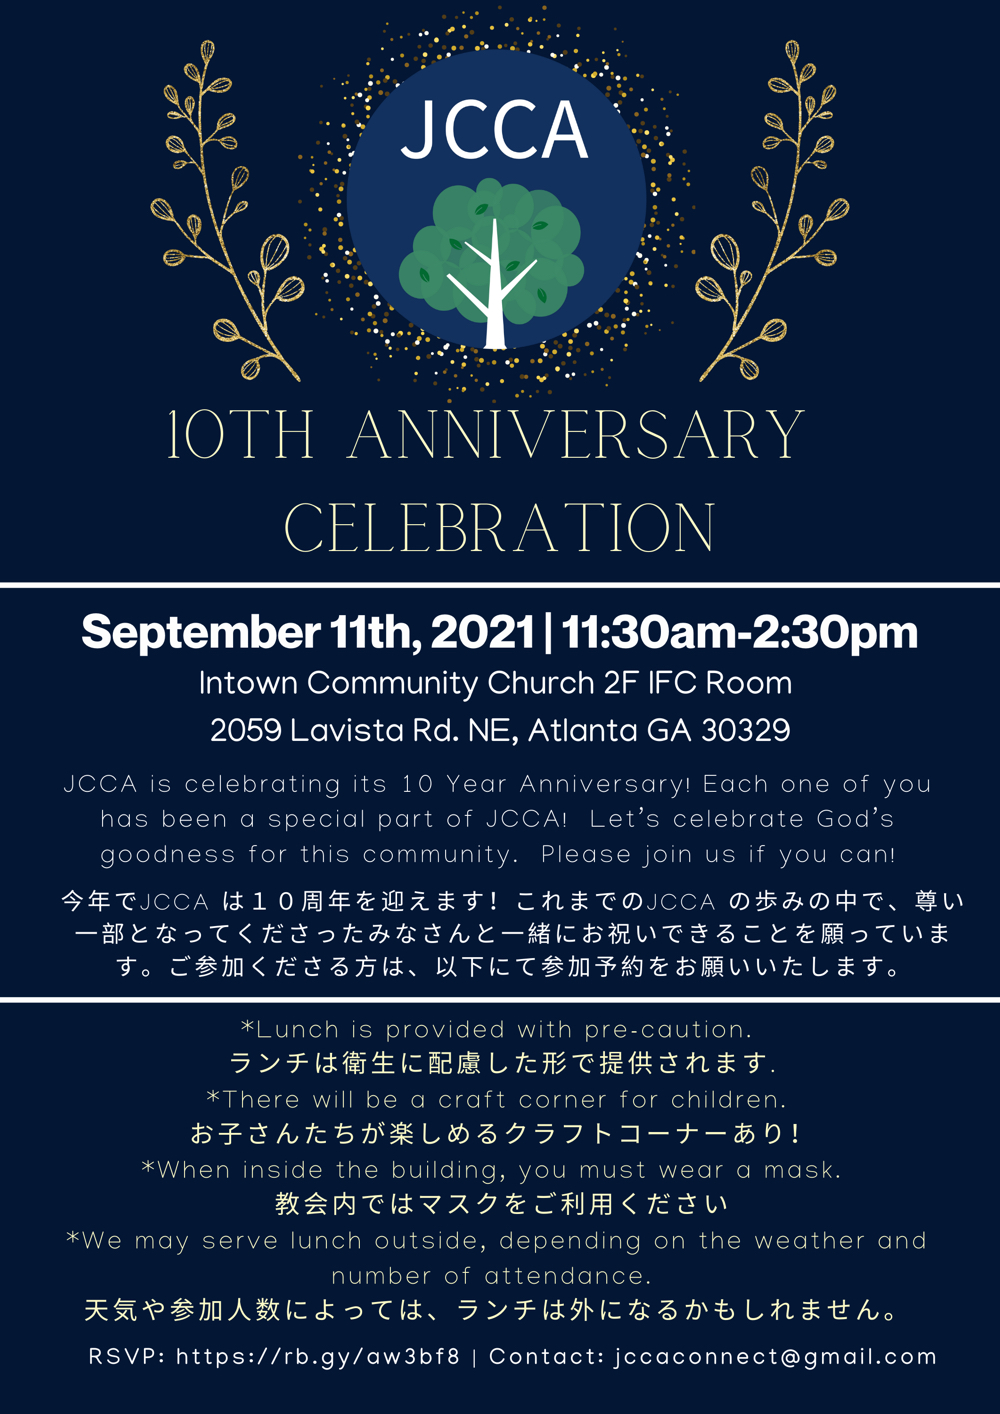 JCCA 10th Anniversary